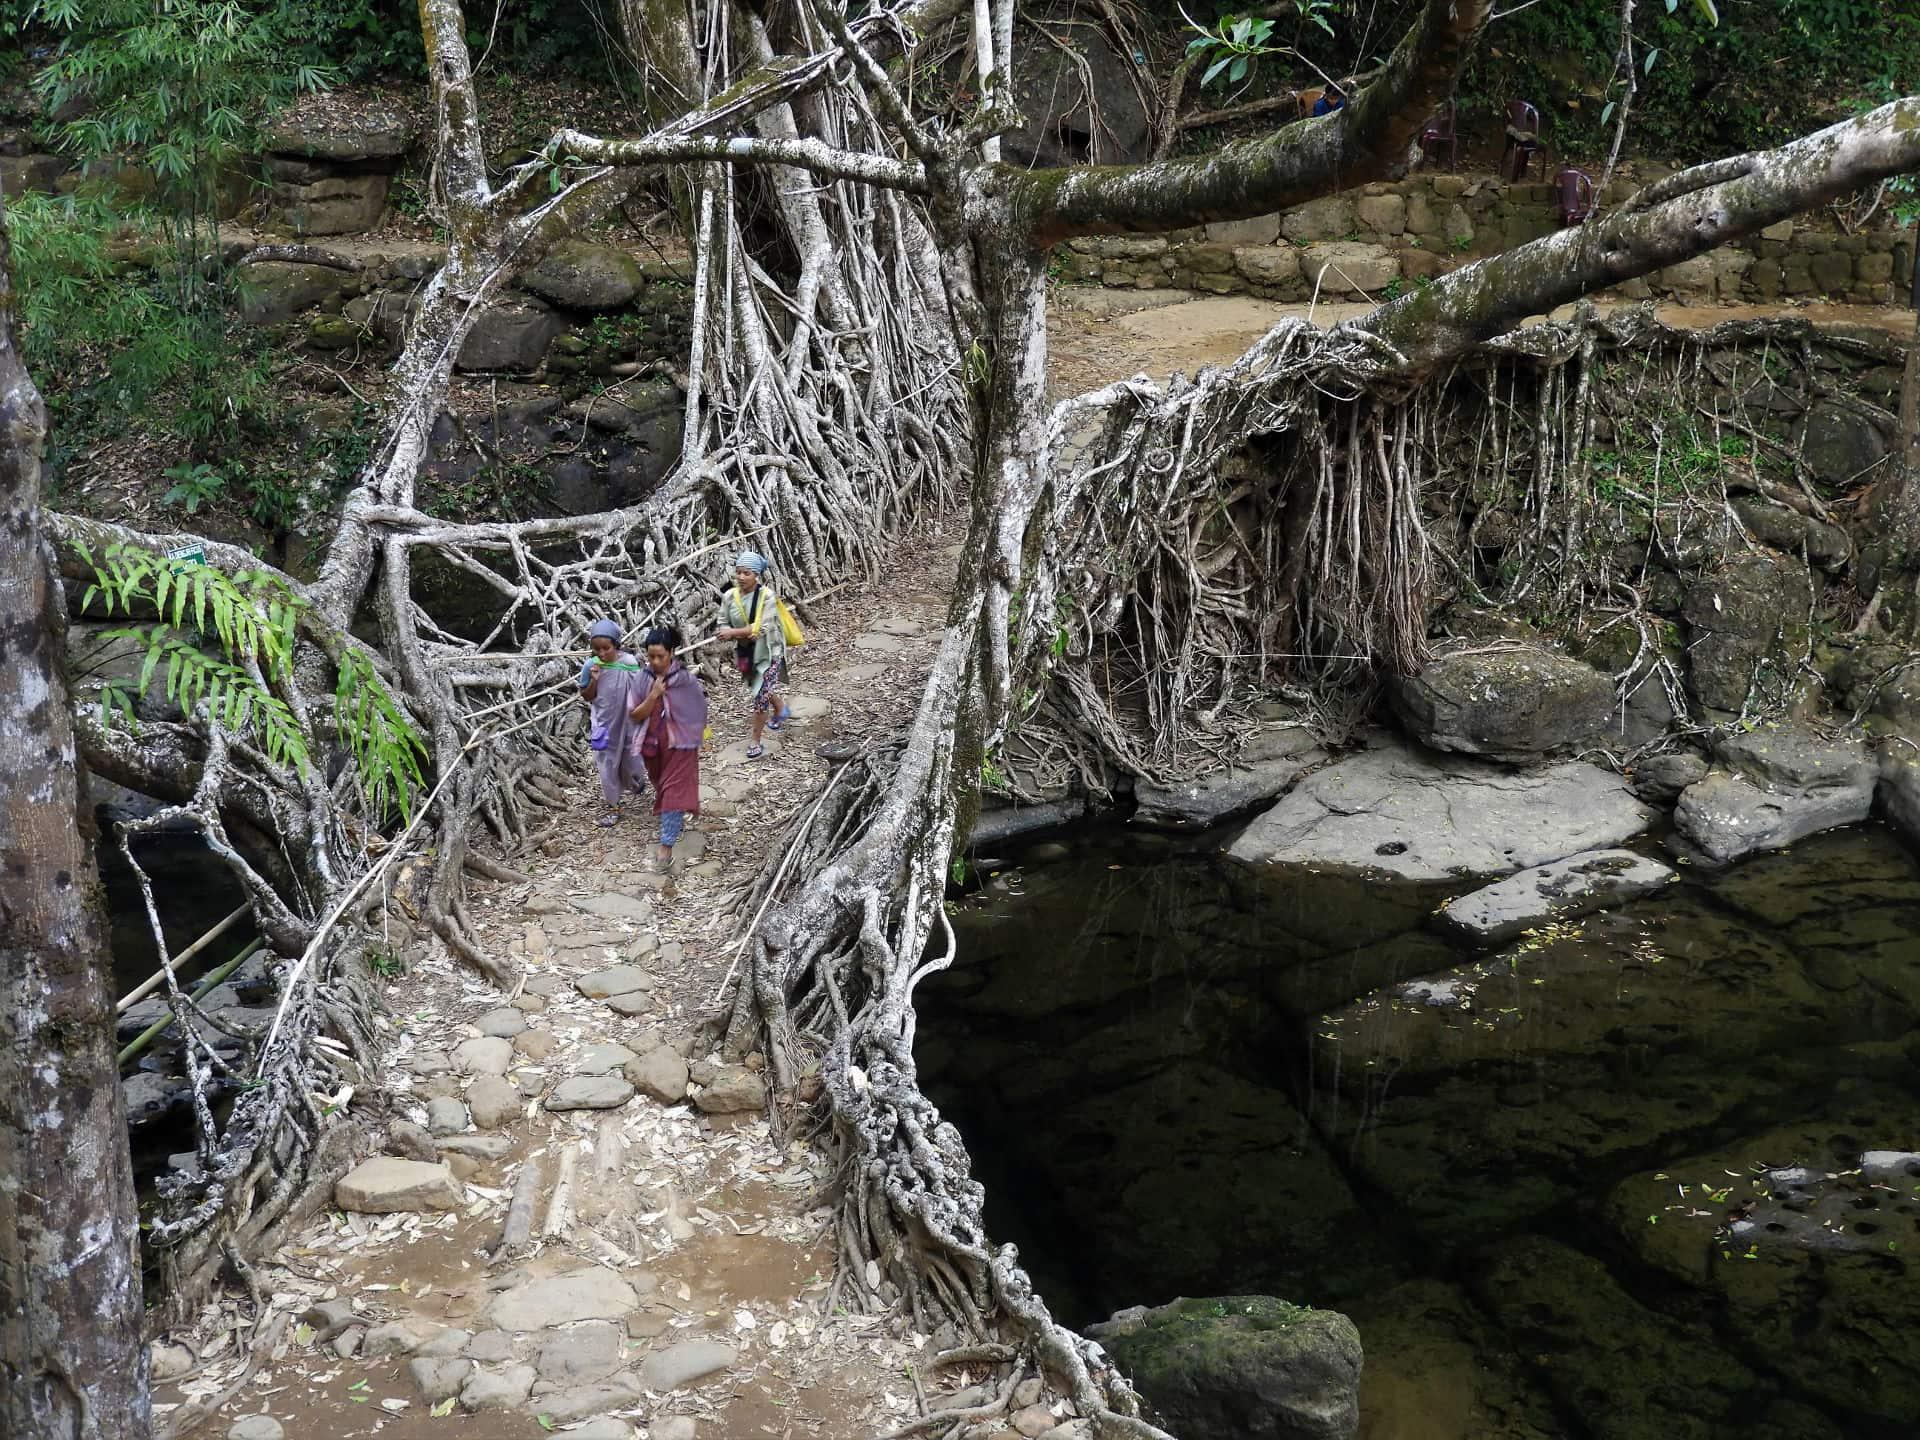 Pont Vivant en racine en Inde du Nord Est - Mawlynnong, Meghalaya